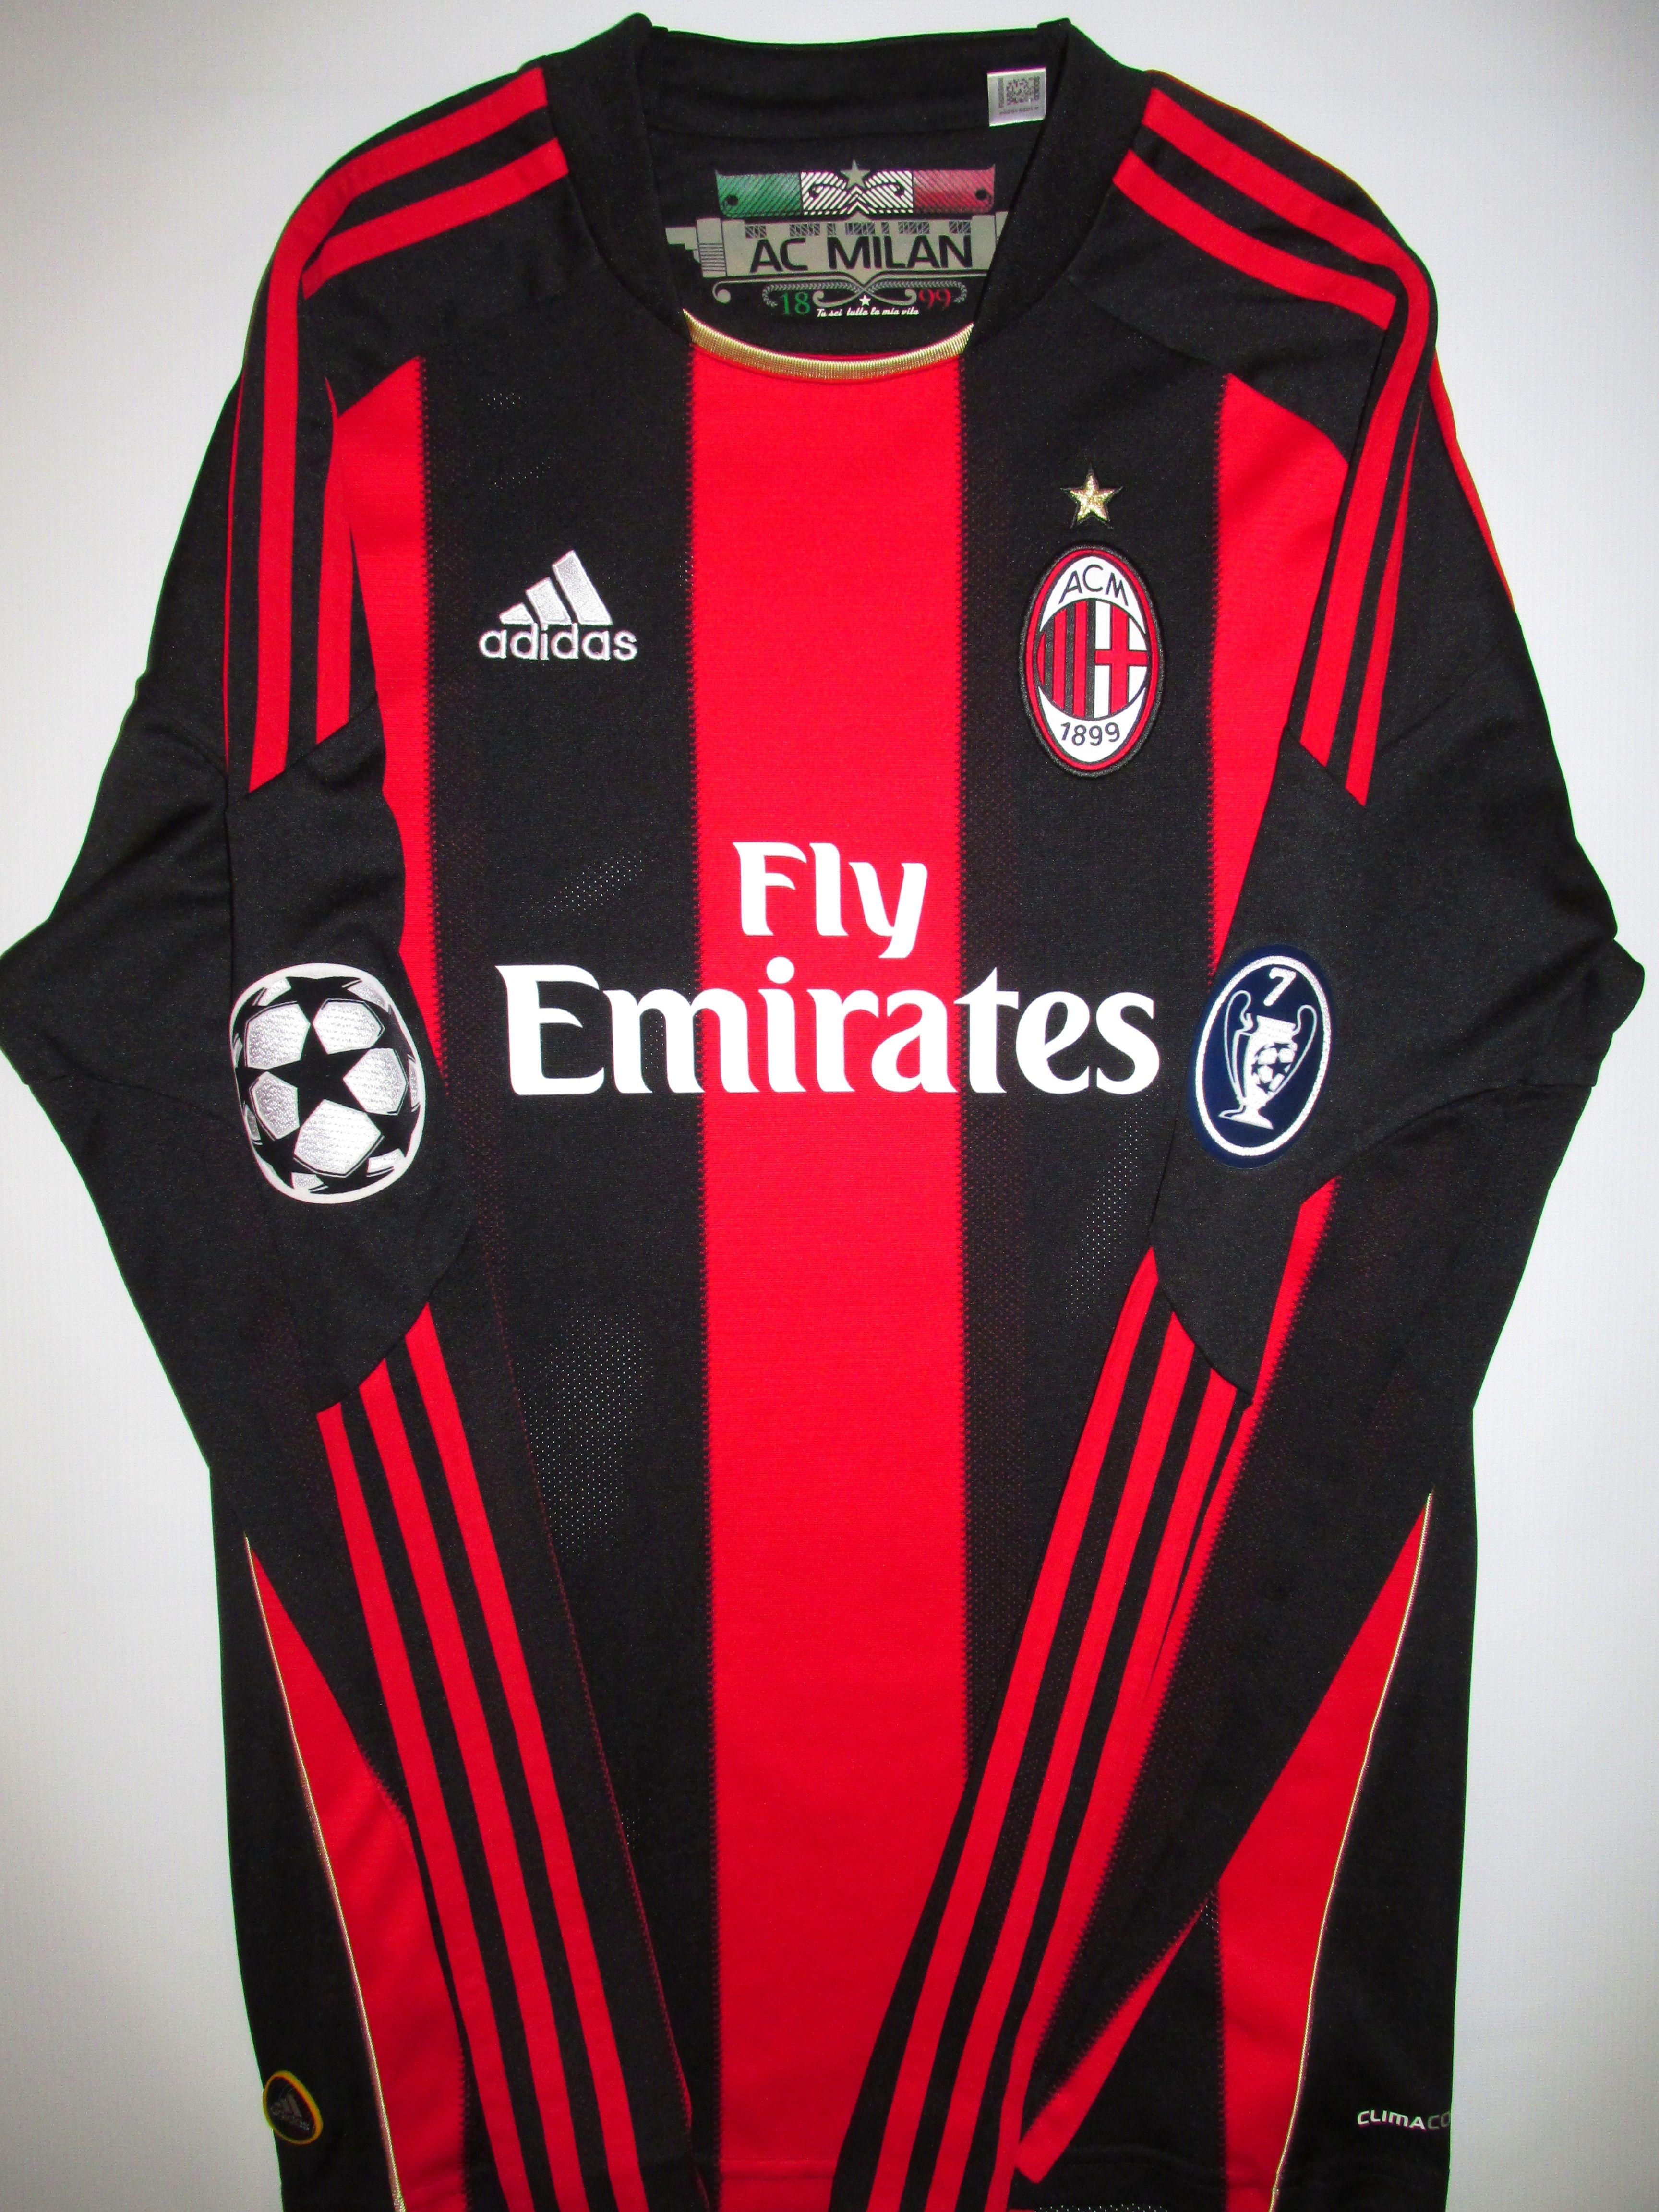 AC Milan 2010/2011 home Champions League football shirt   Soccer ...